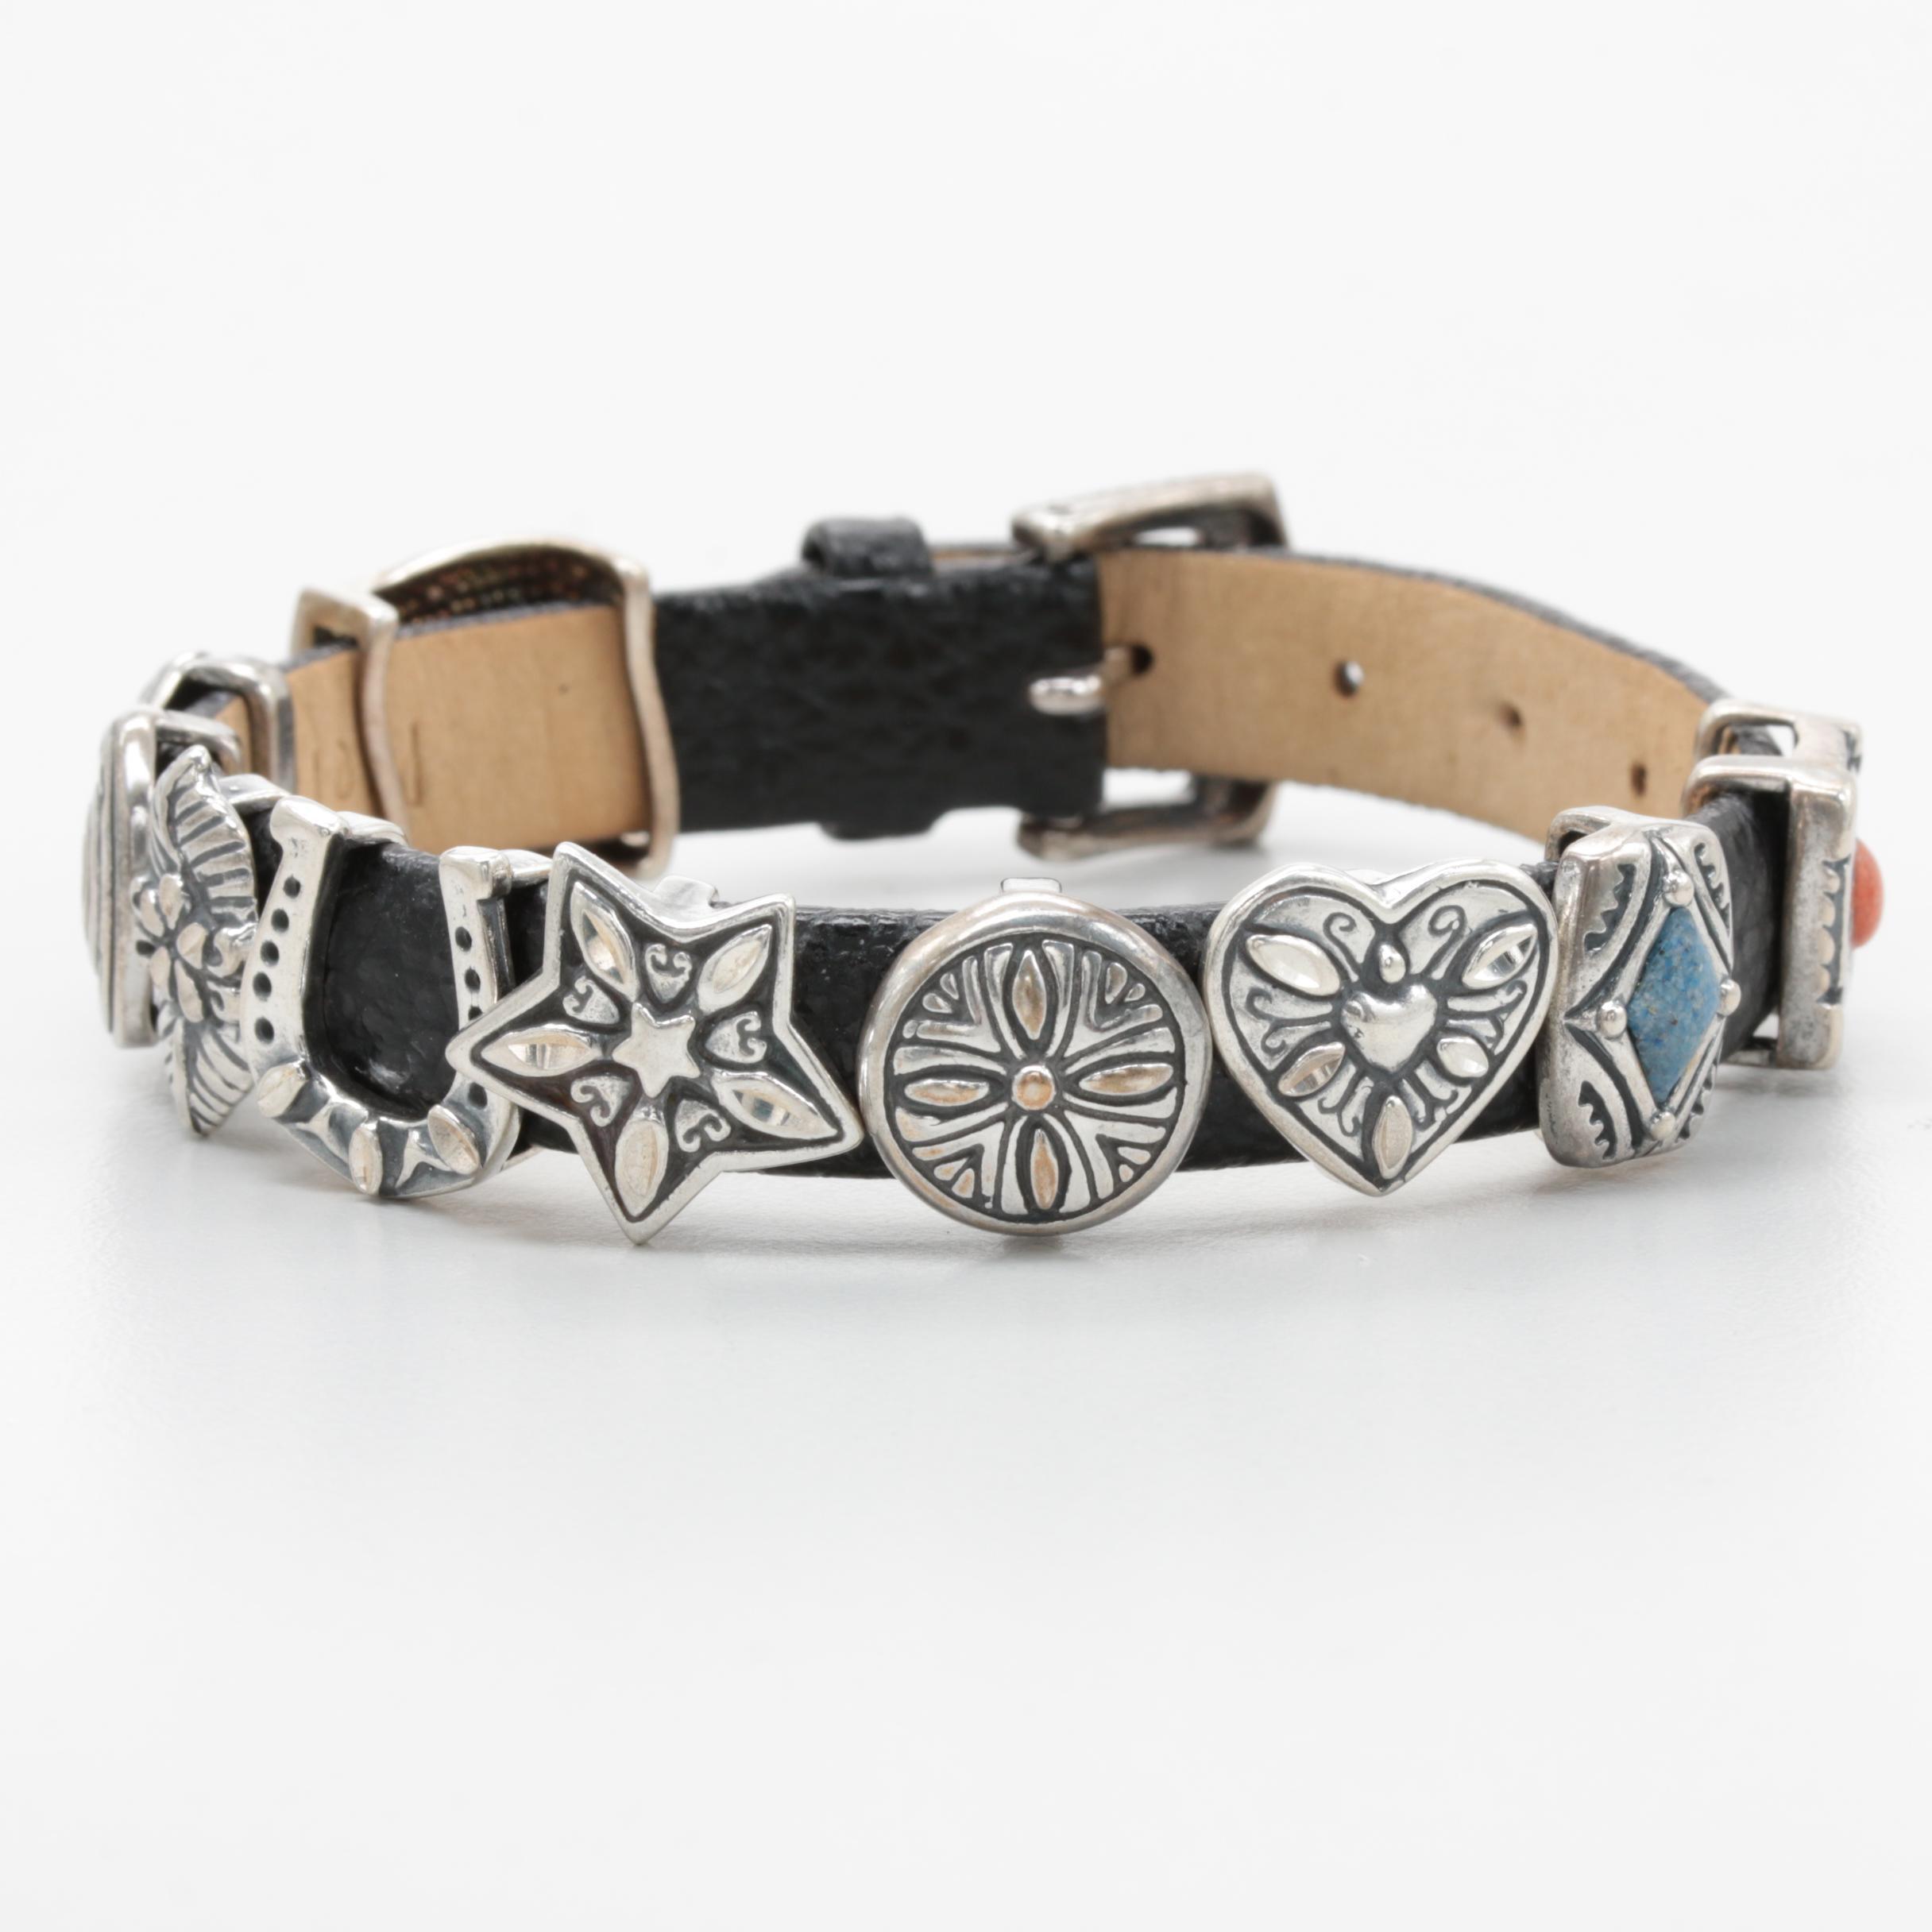 Southwestern Style Sterling Silver and Leather Slide Charm Bracelet